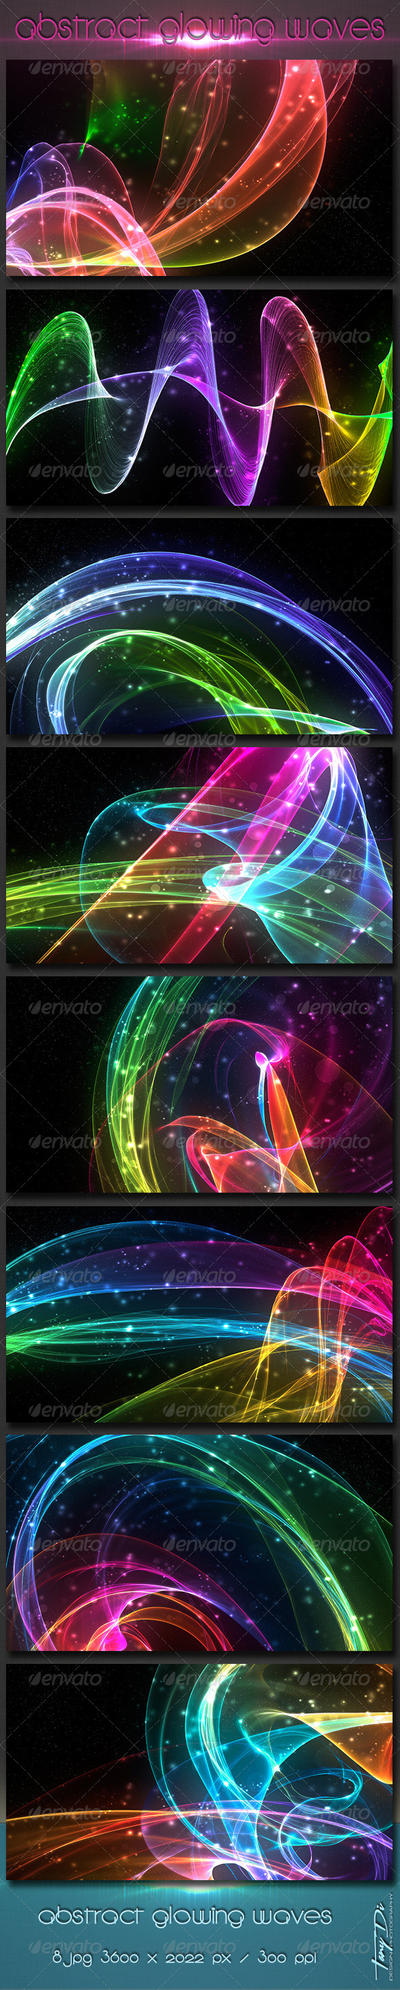 Abstract Glowing Waves 1 by AzureRayArt